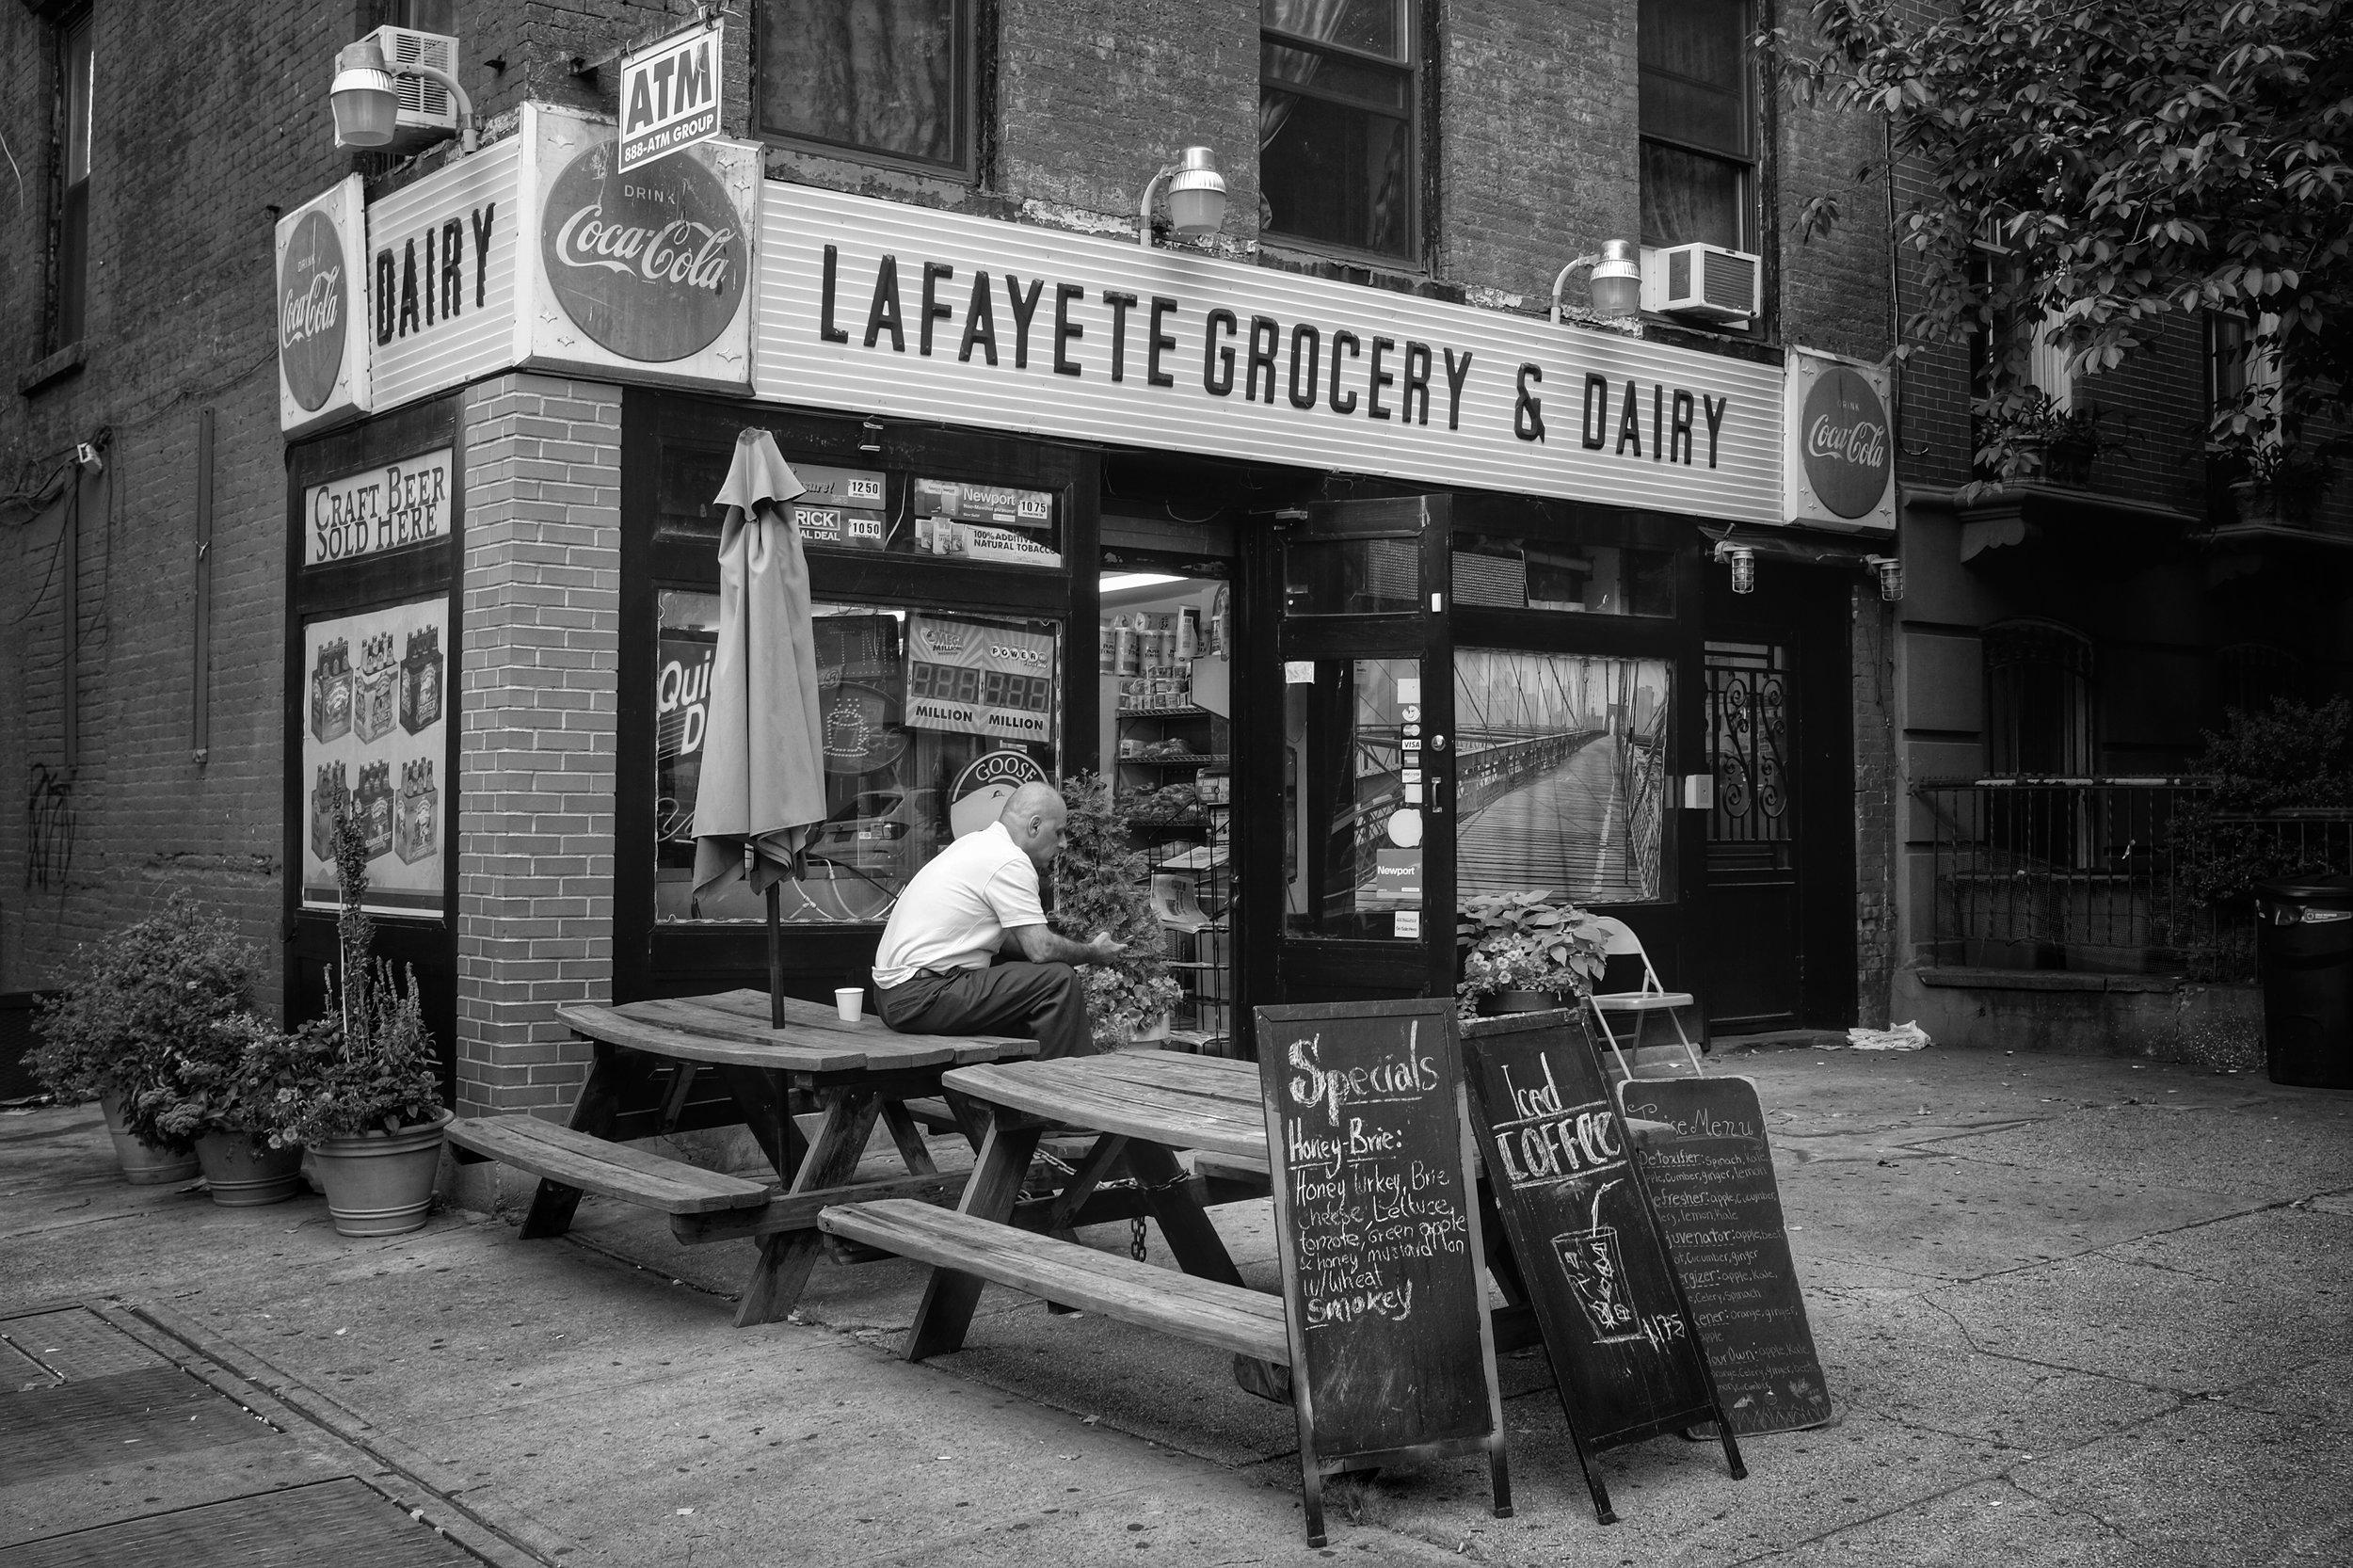 Lafayete Grocery & Dairy. Fort Greene. Brooklyn. New York. 2016.